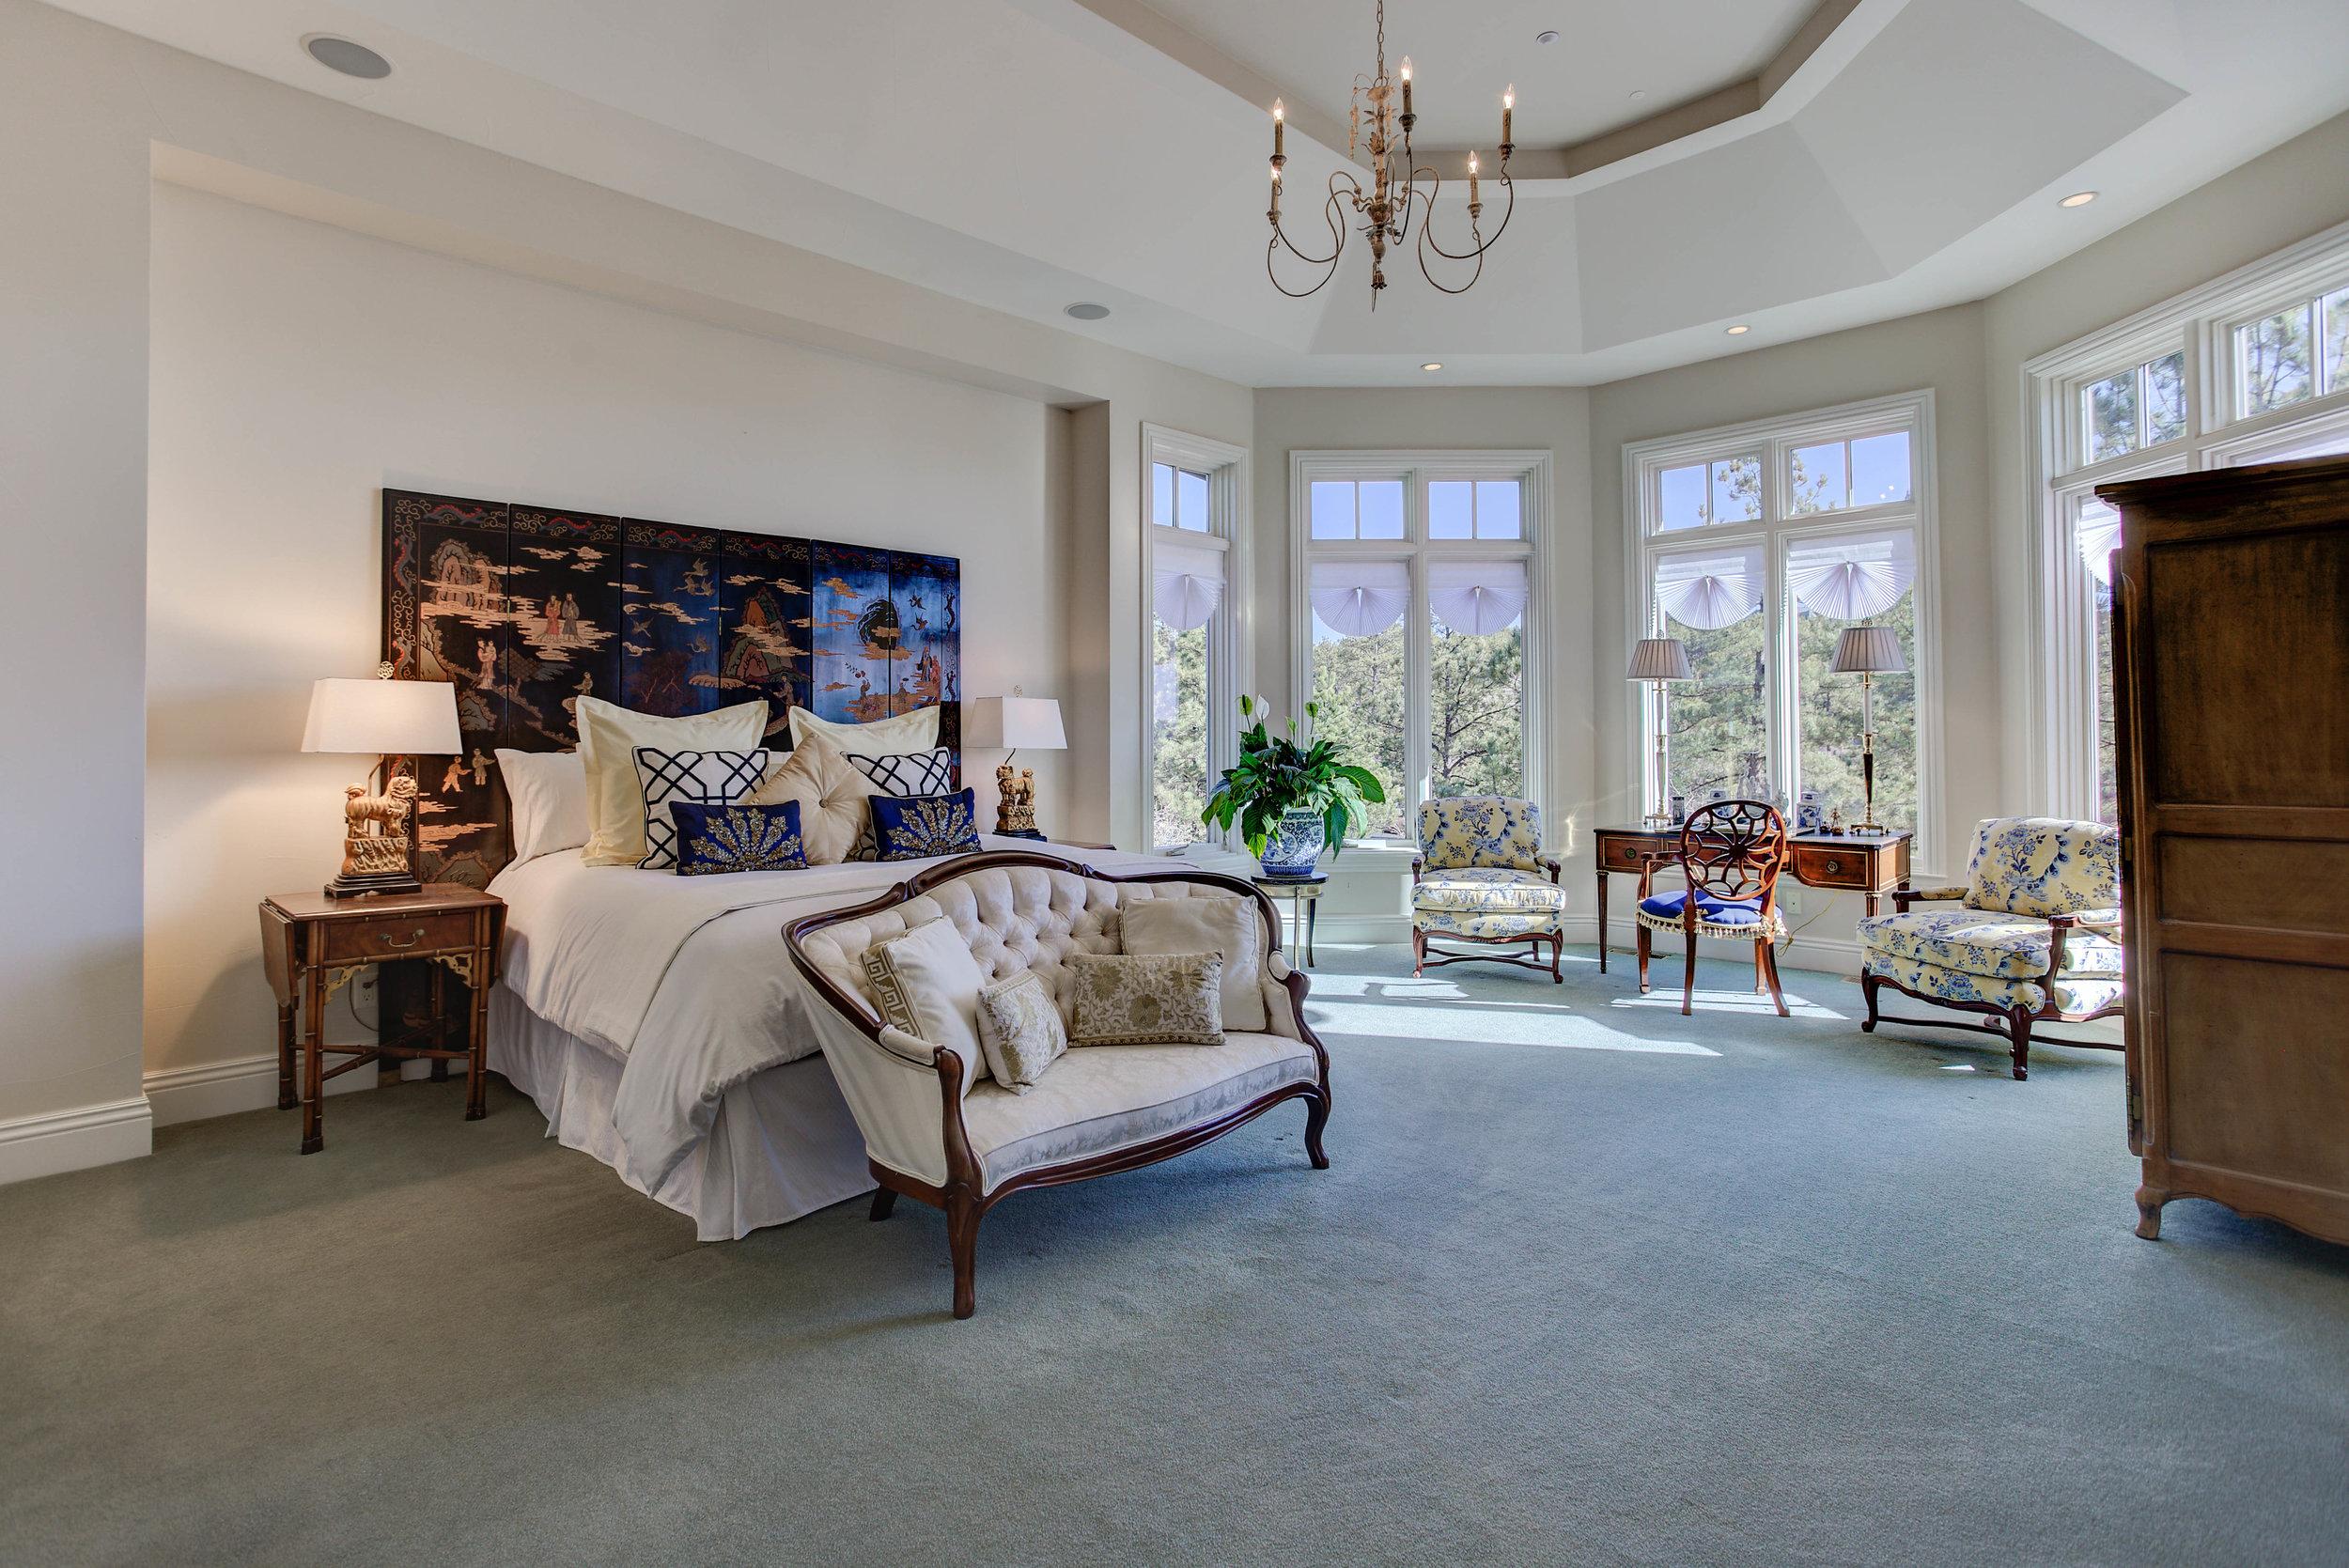 Master Bedroom - Complete